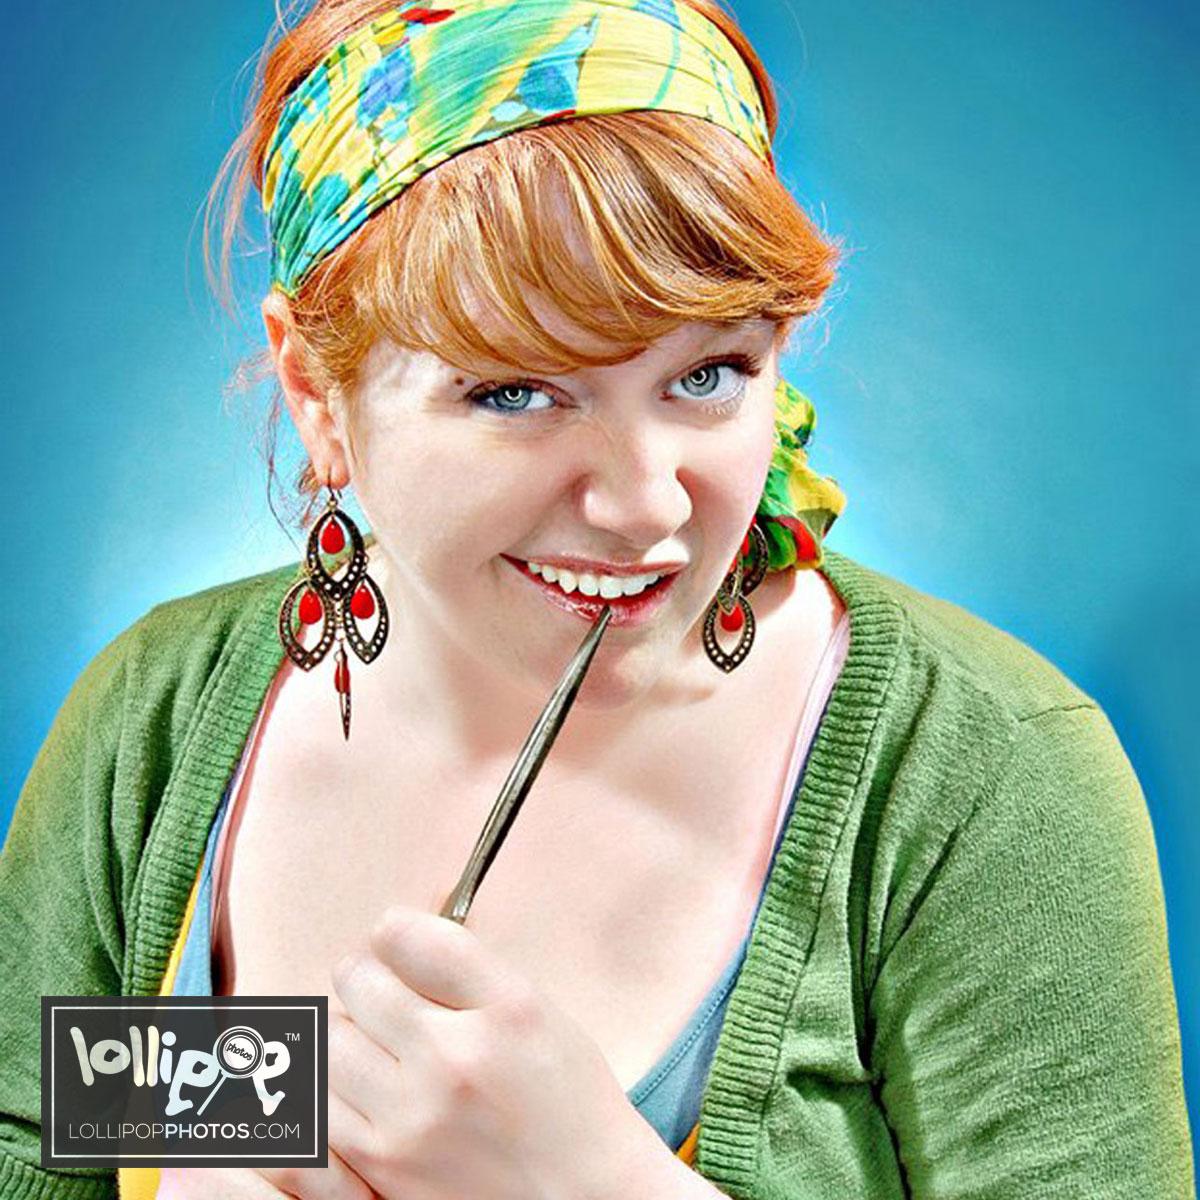 msdig-nora-canfield-lollipop-photos-069.jpg